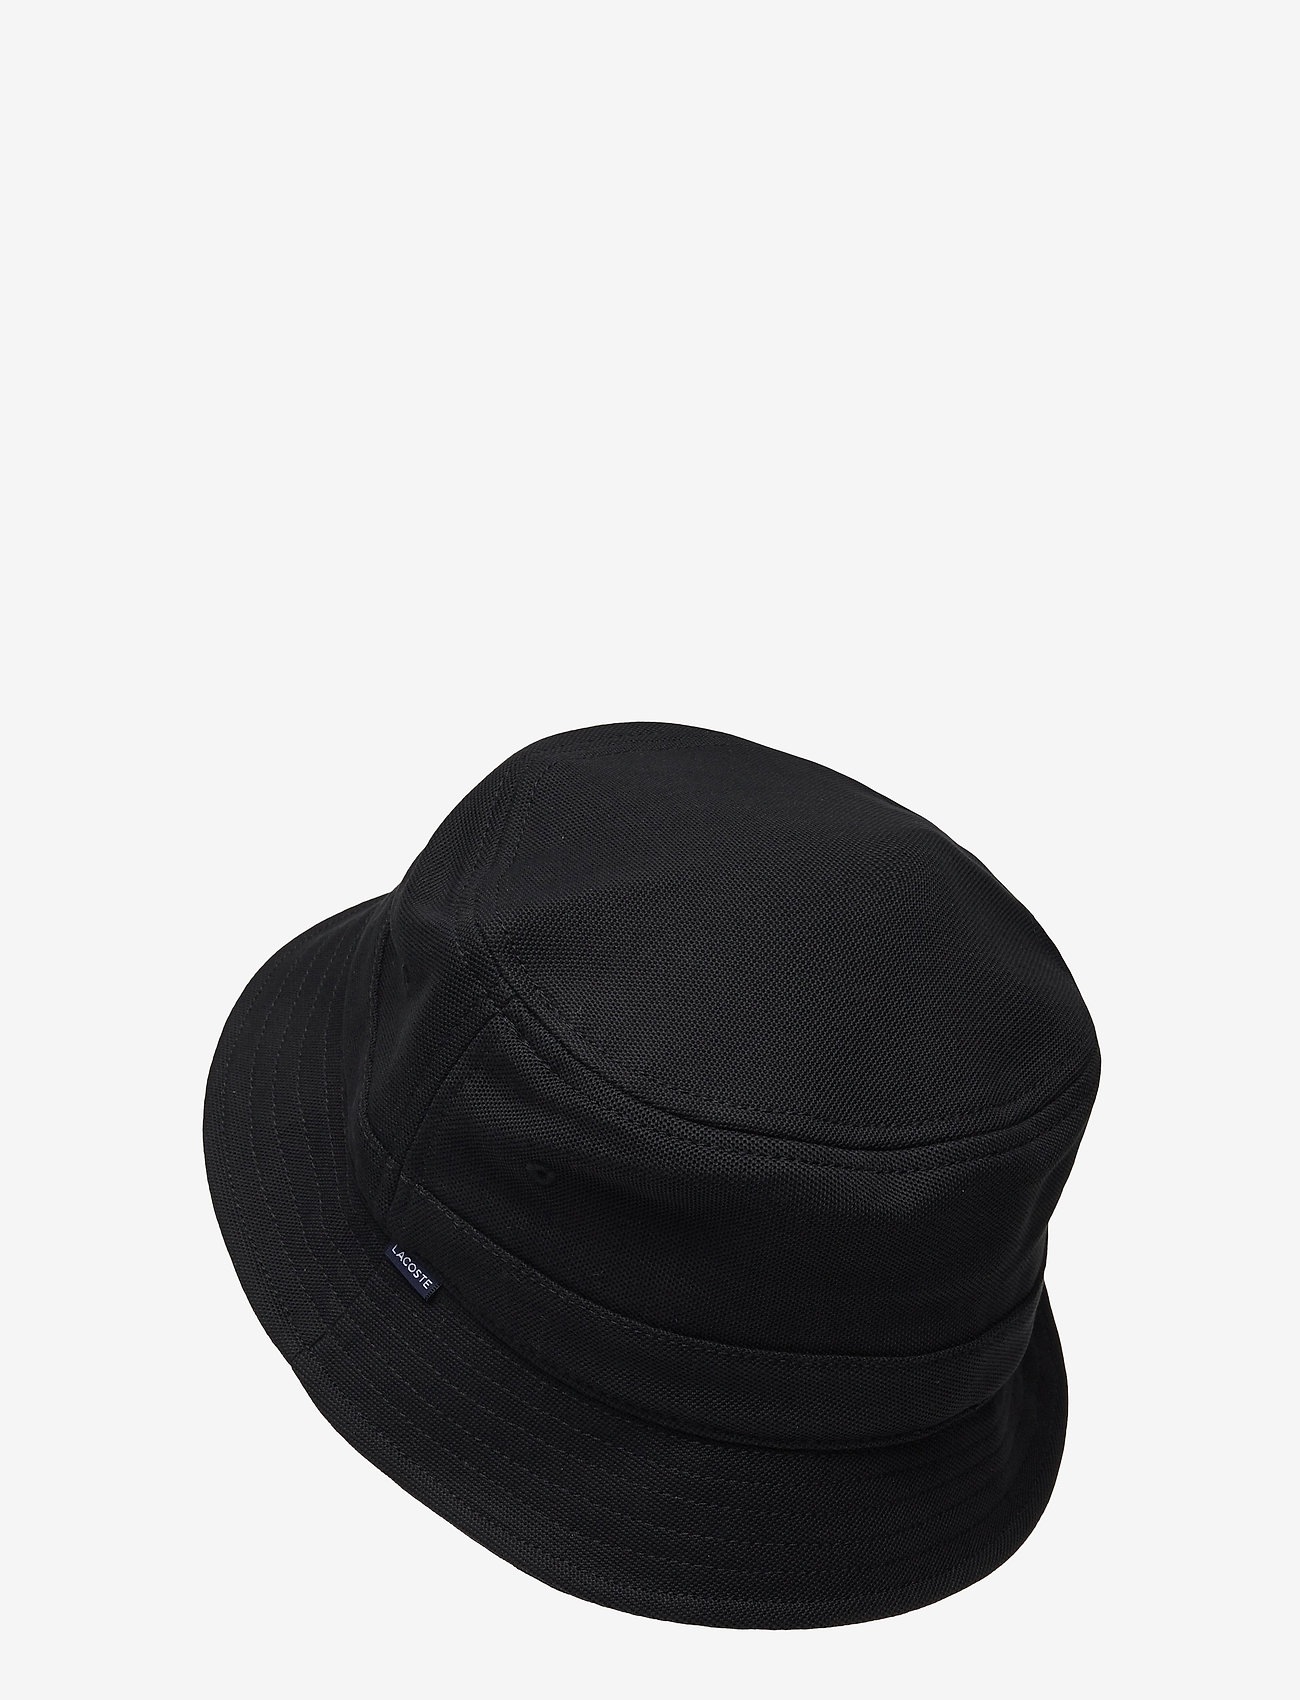 Lacoste - Cap - bucket hats - black - 1